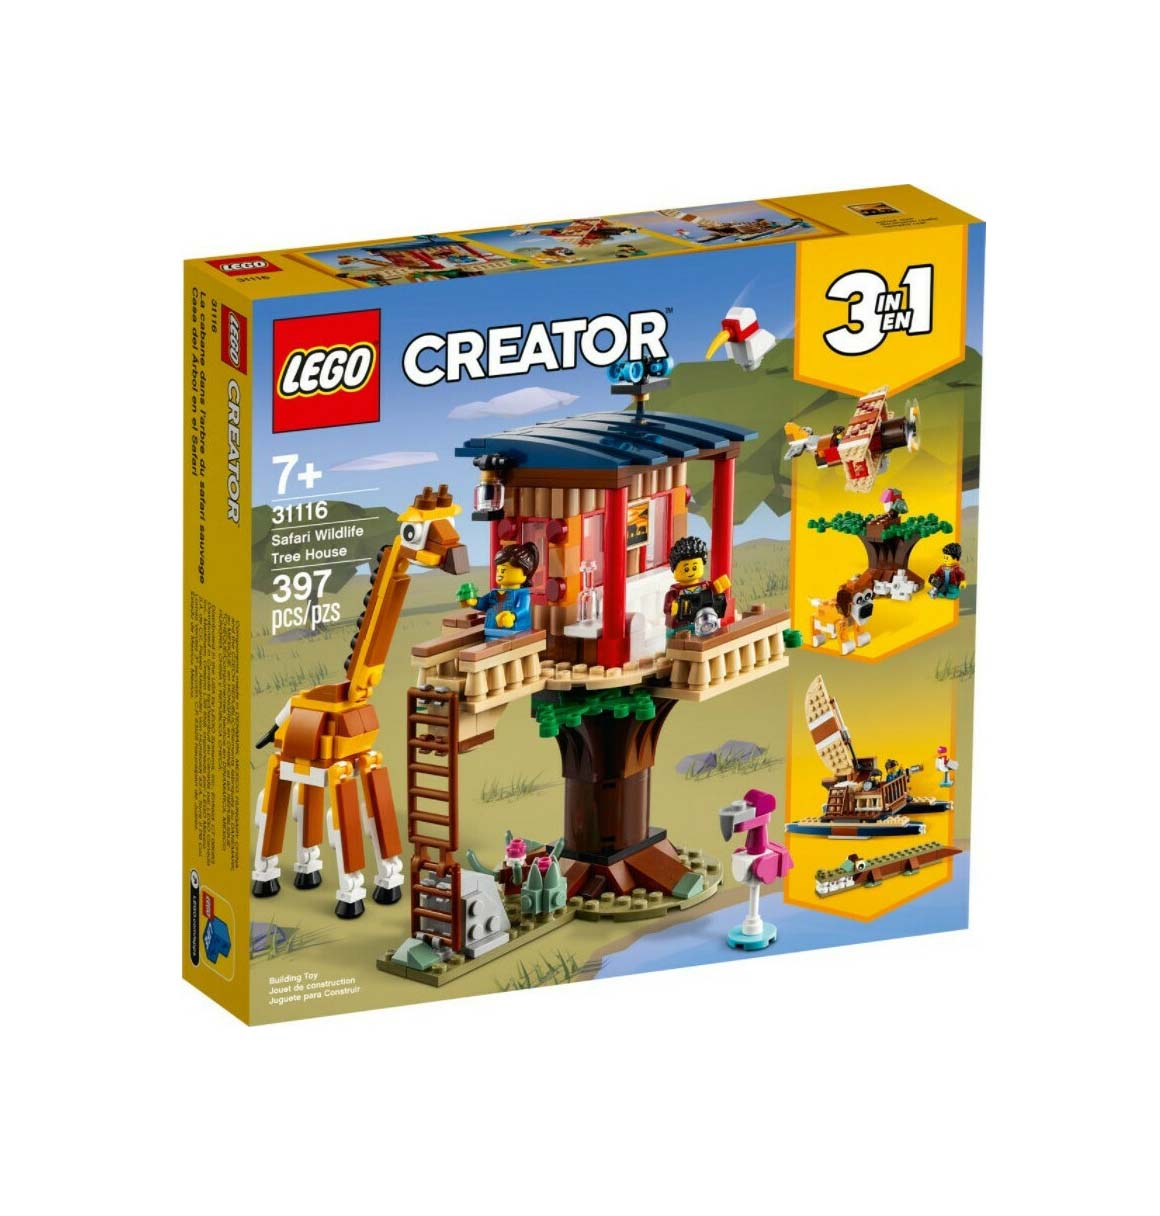 Lego Creator: Safari Wildlife Tree House 31116